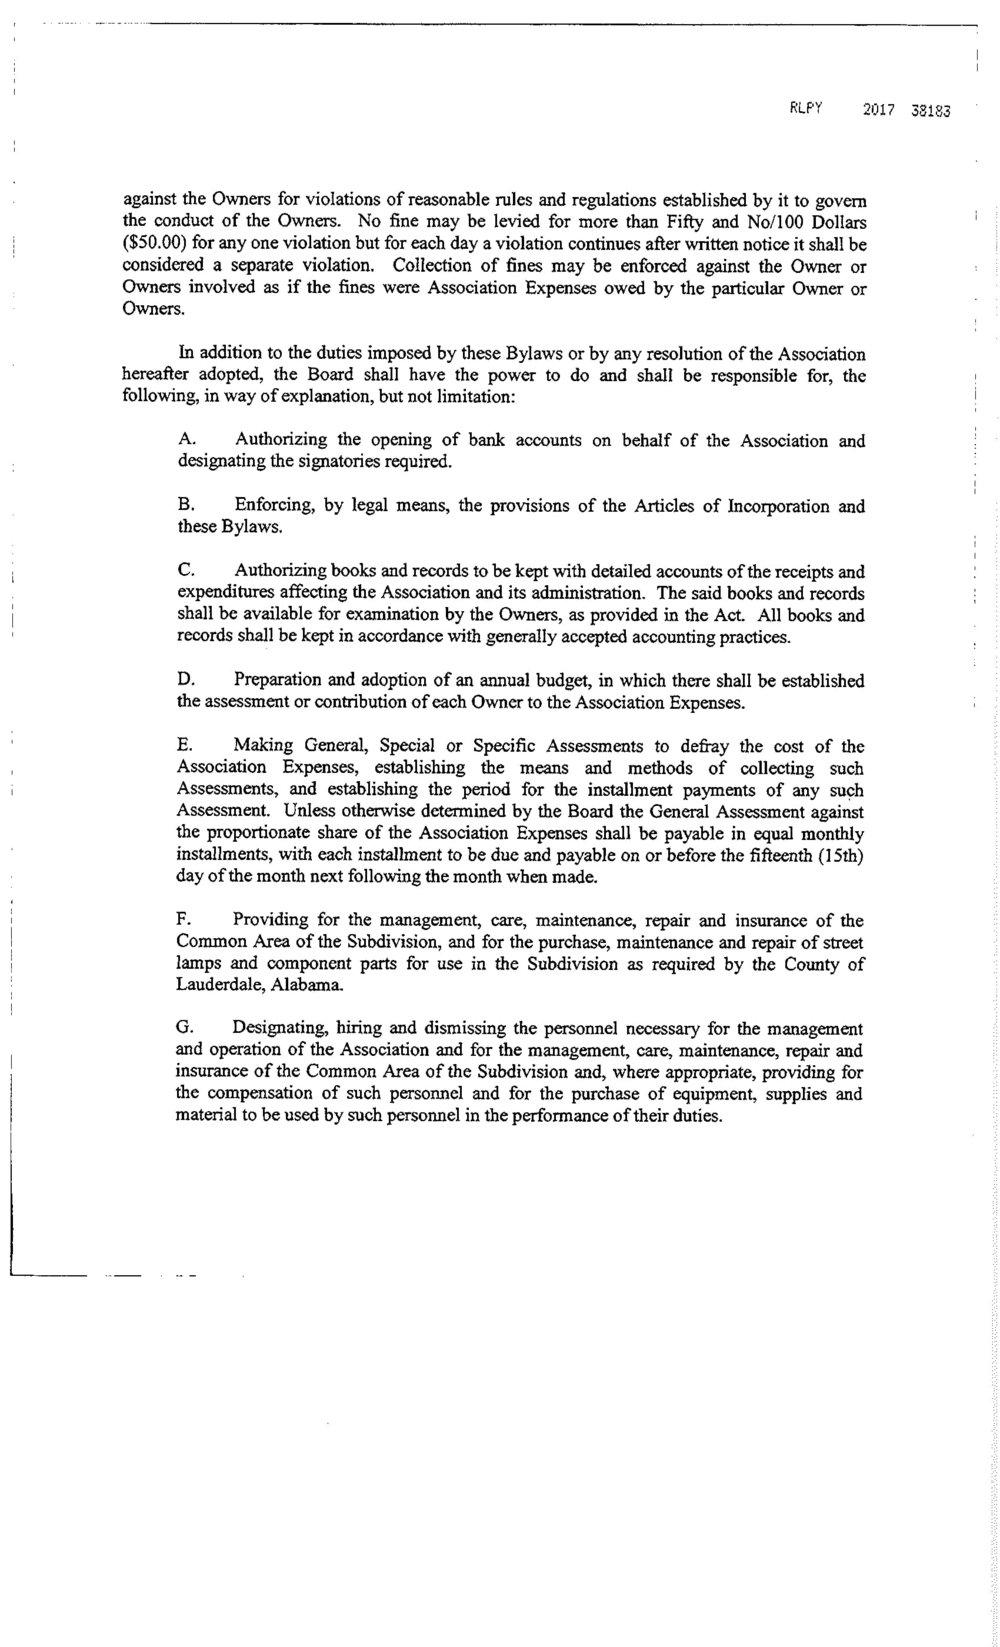 Covenants-Pine-Ridge-Subdivision-1-74.jpg